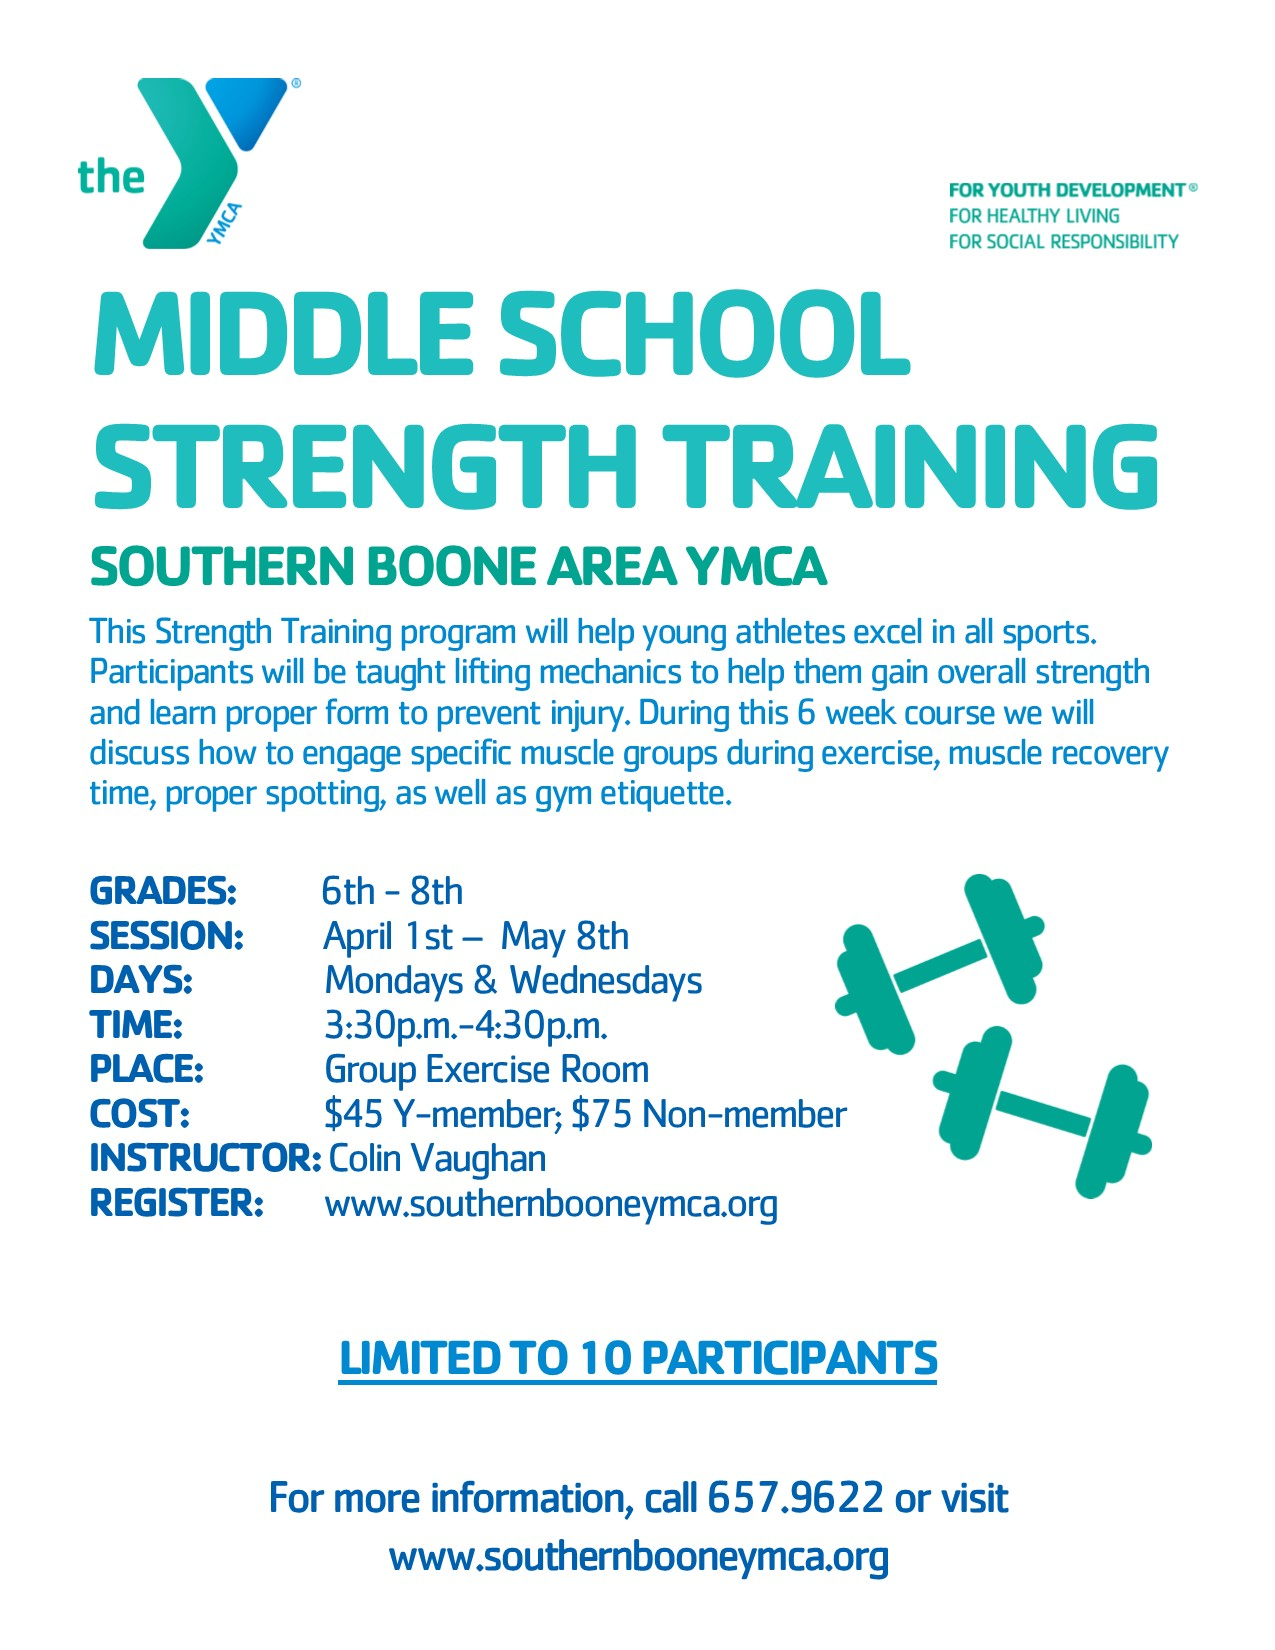 Middle School Strength Training